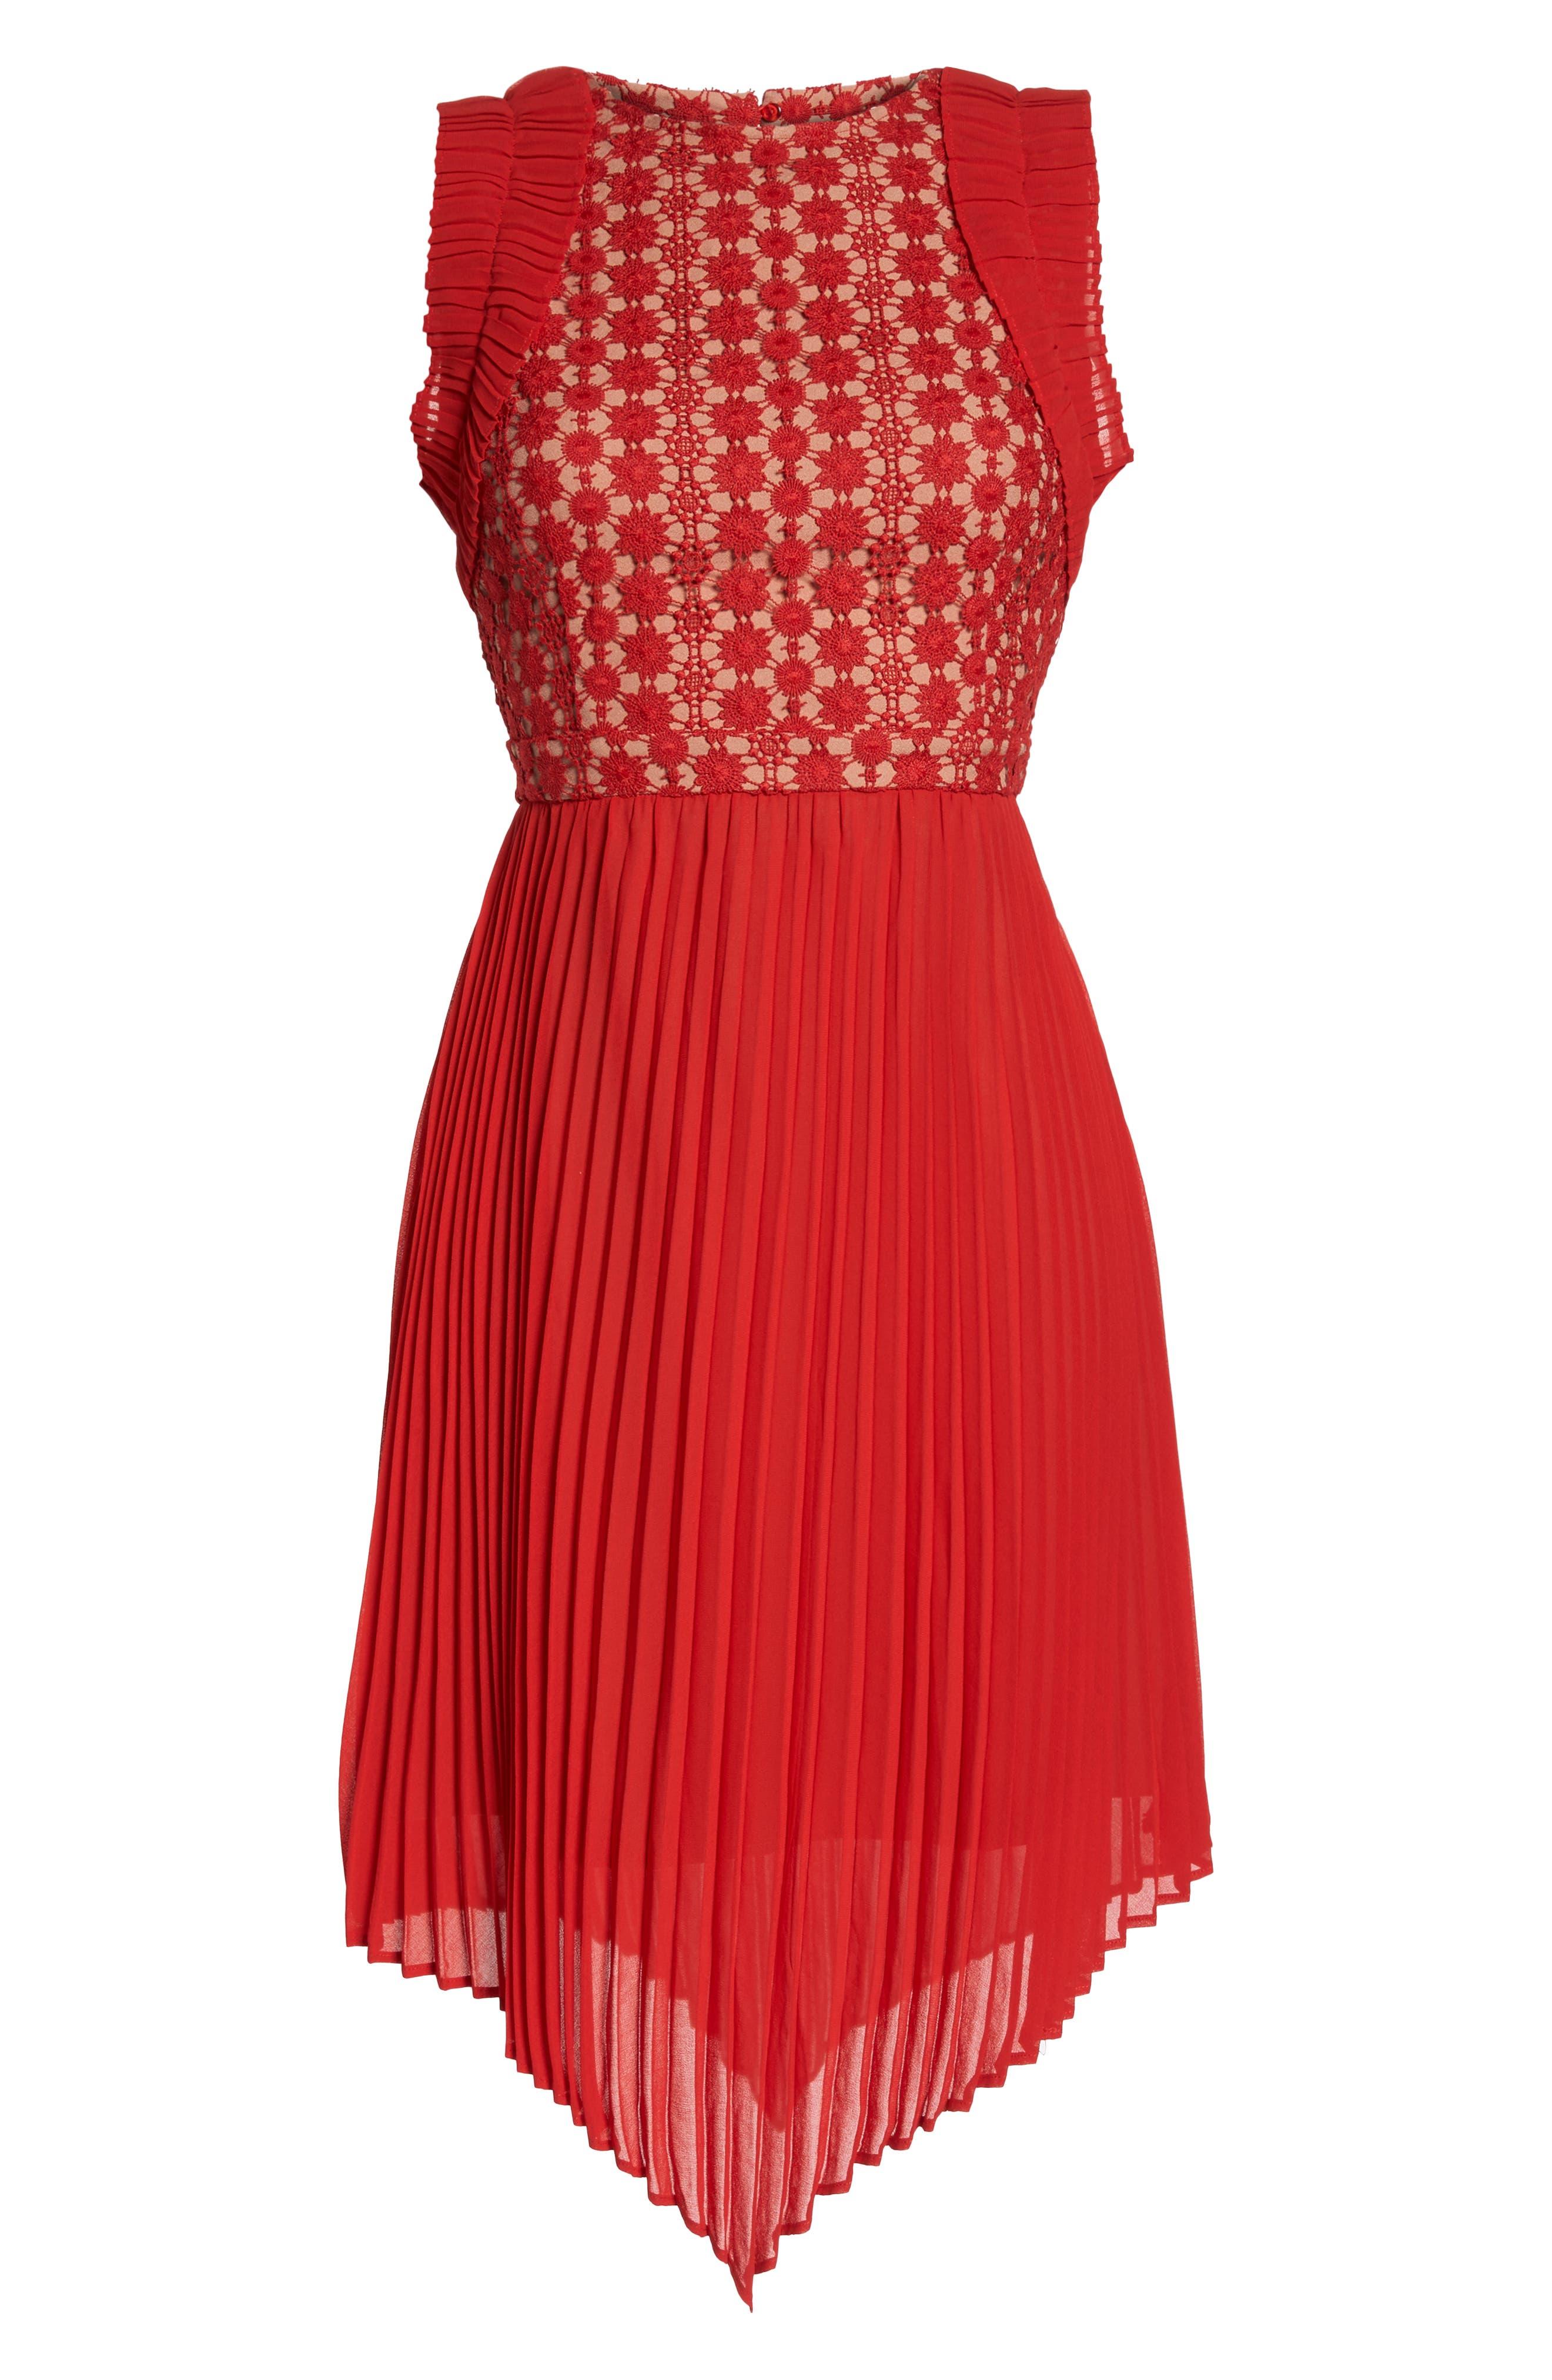 Nealea Pleated Sheath Dress,                             Alternate thumbnail 8, color,                             Red